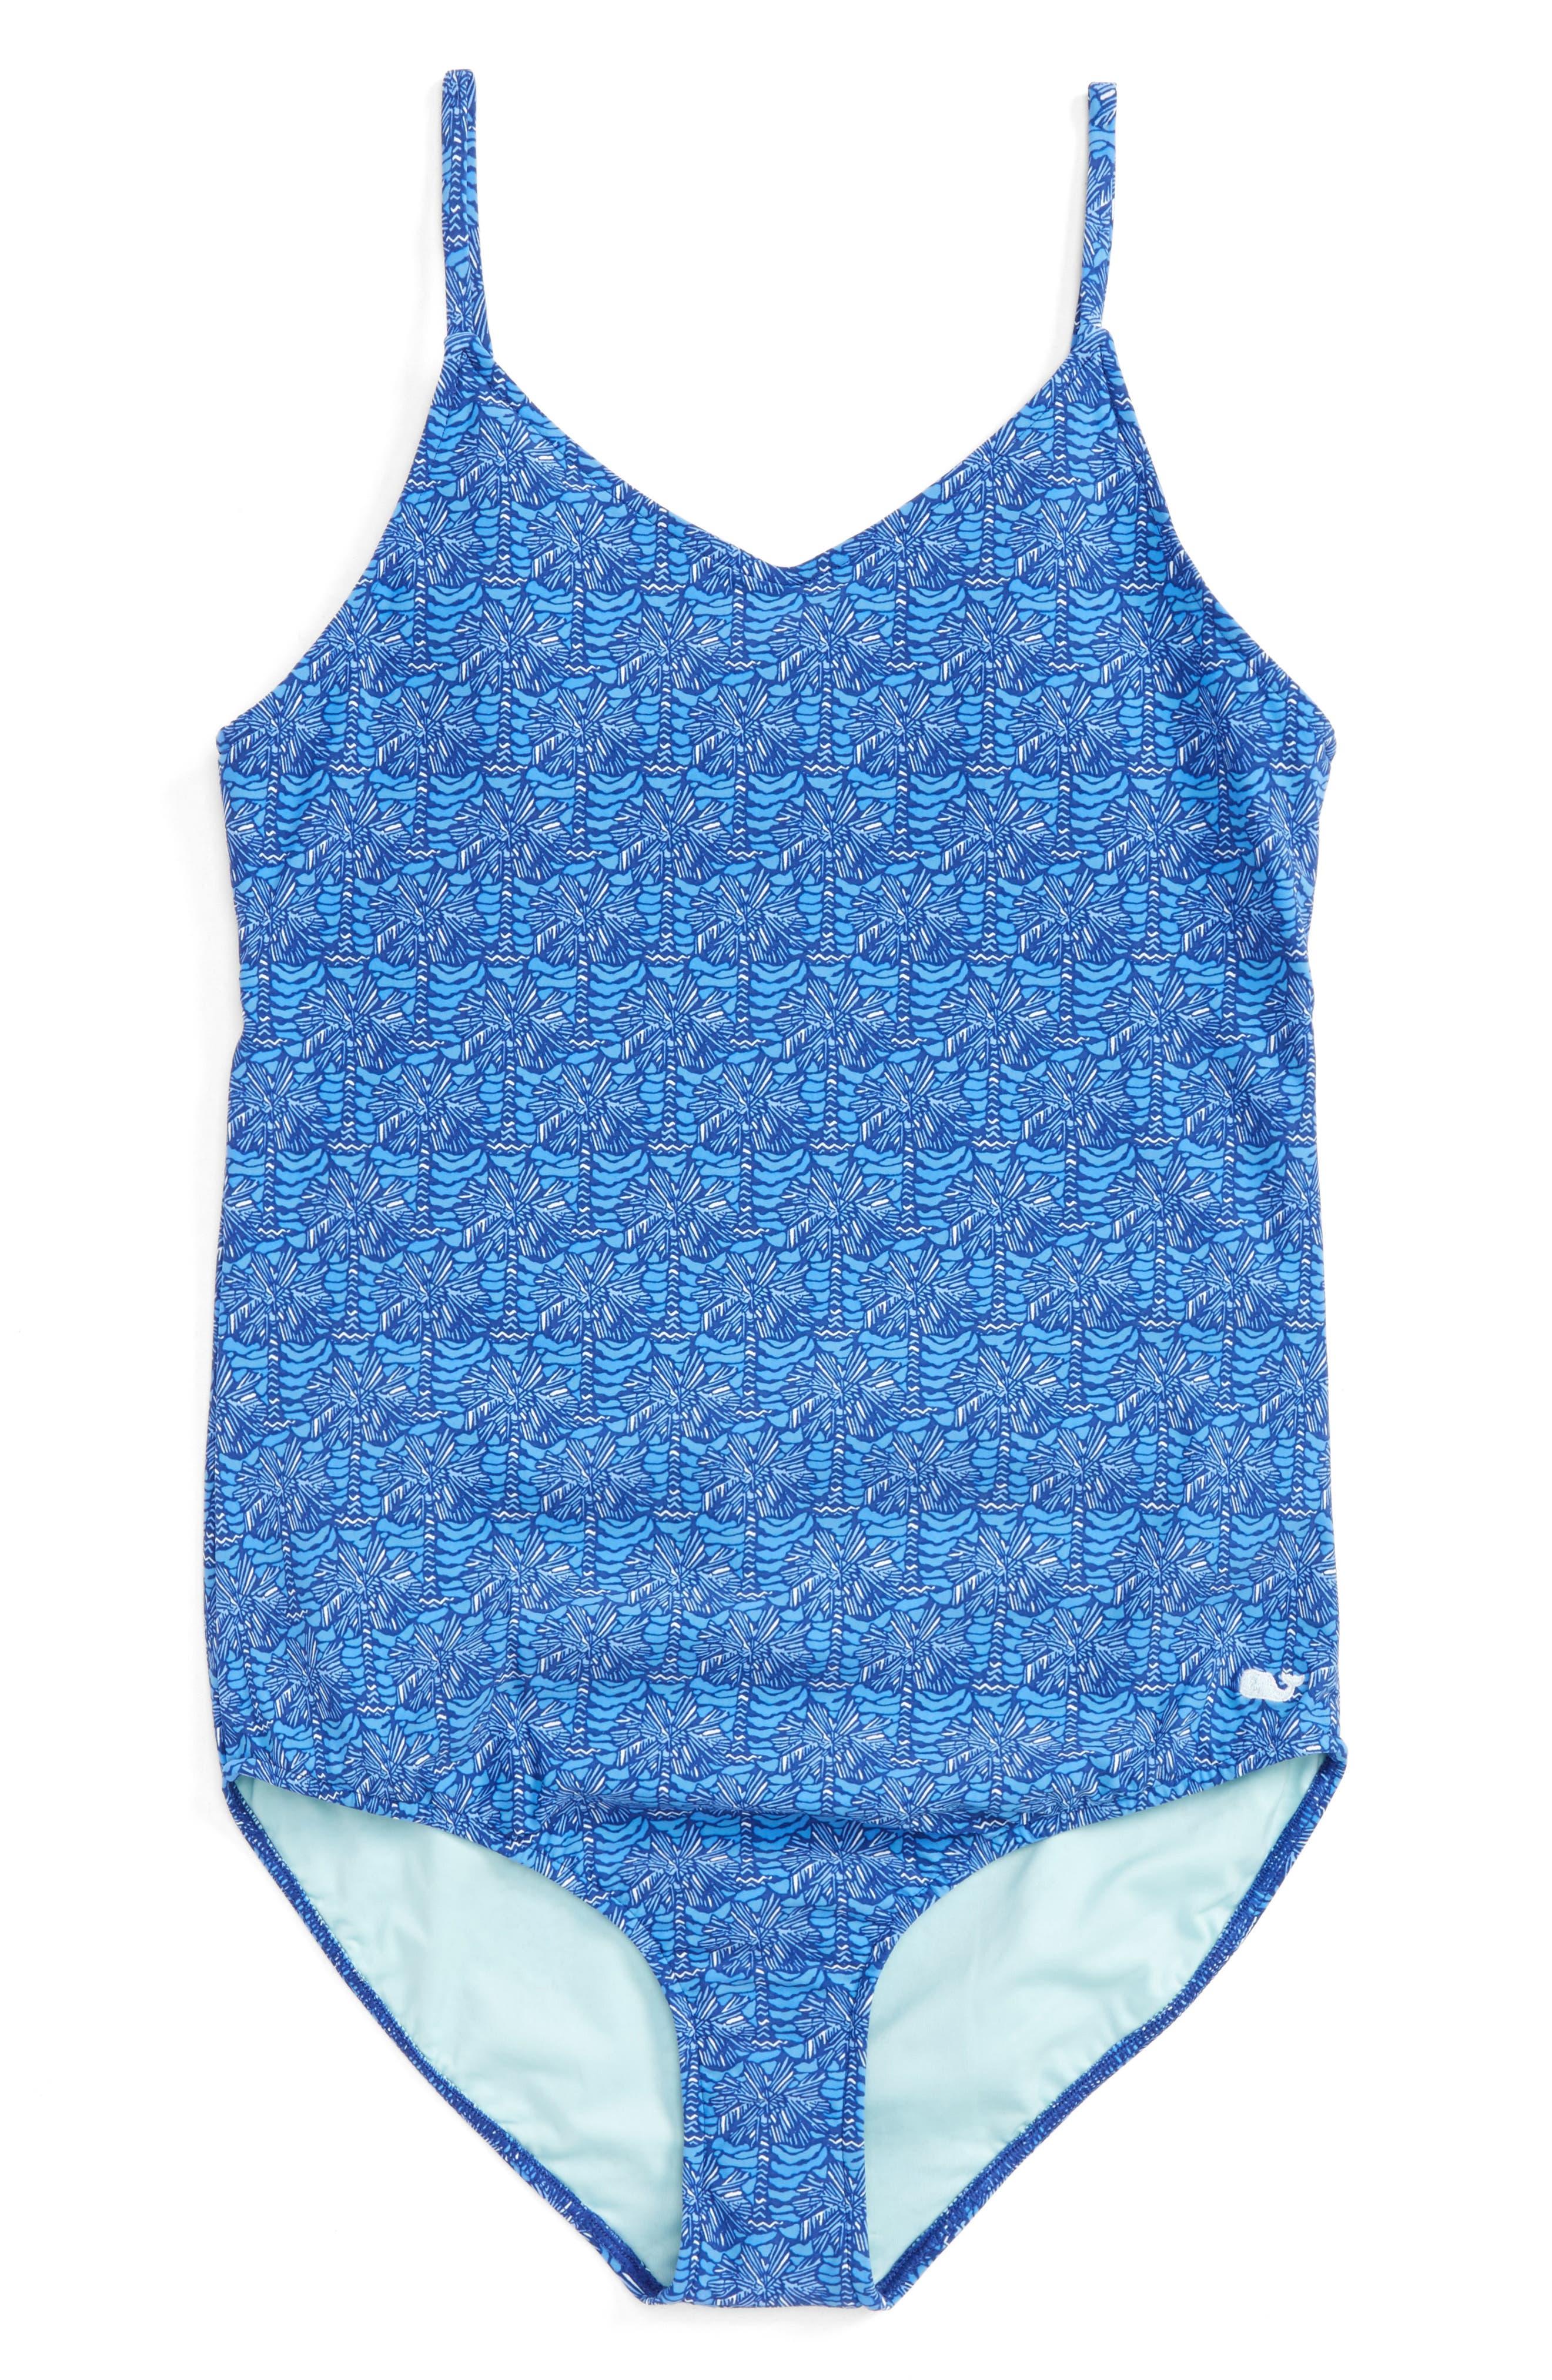 Main Image - vineyard vines Palmetto Print One-Piece Swimsuit (Little Girls & Big Girls)